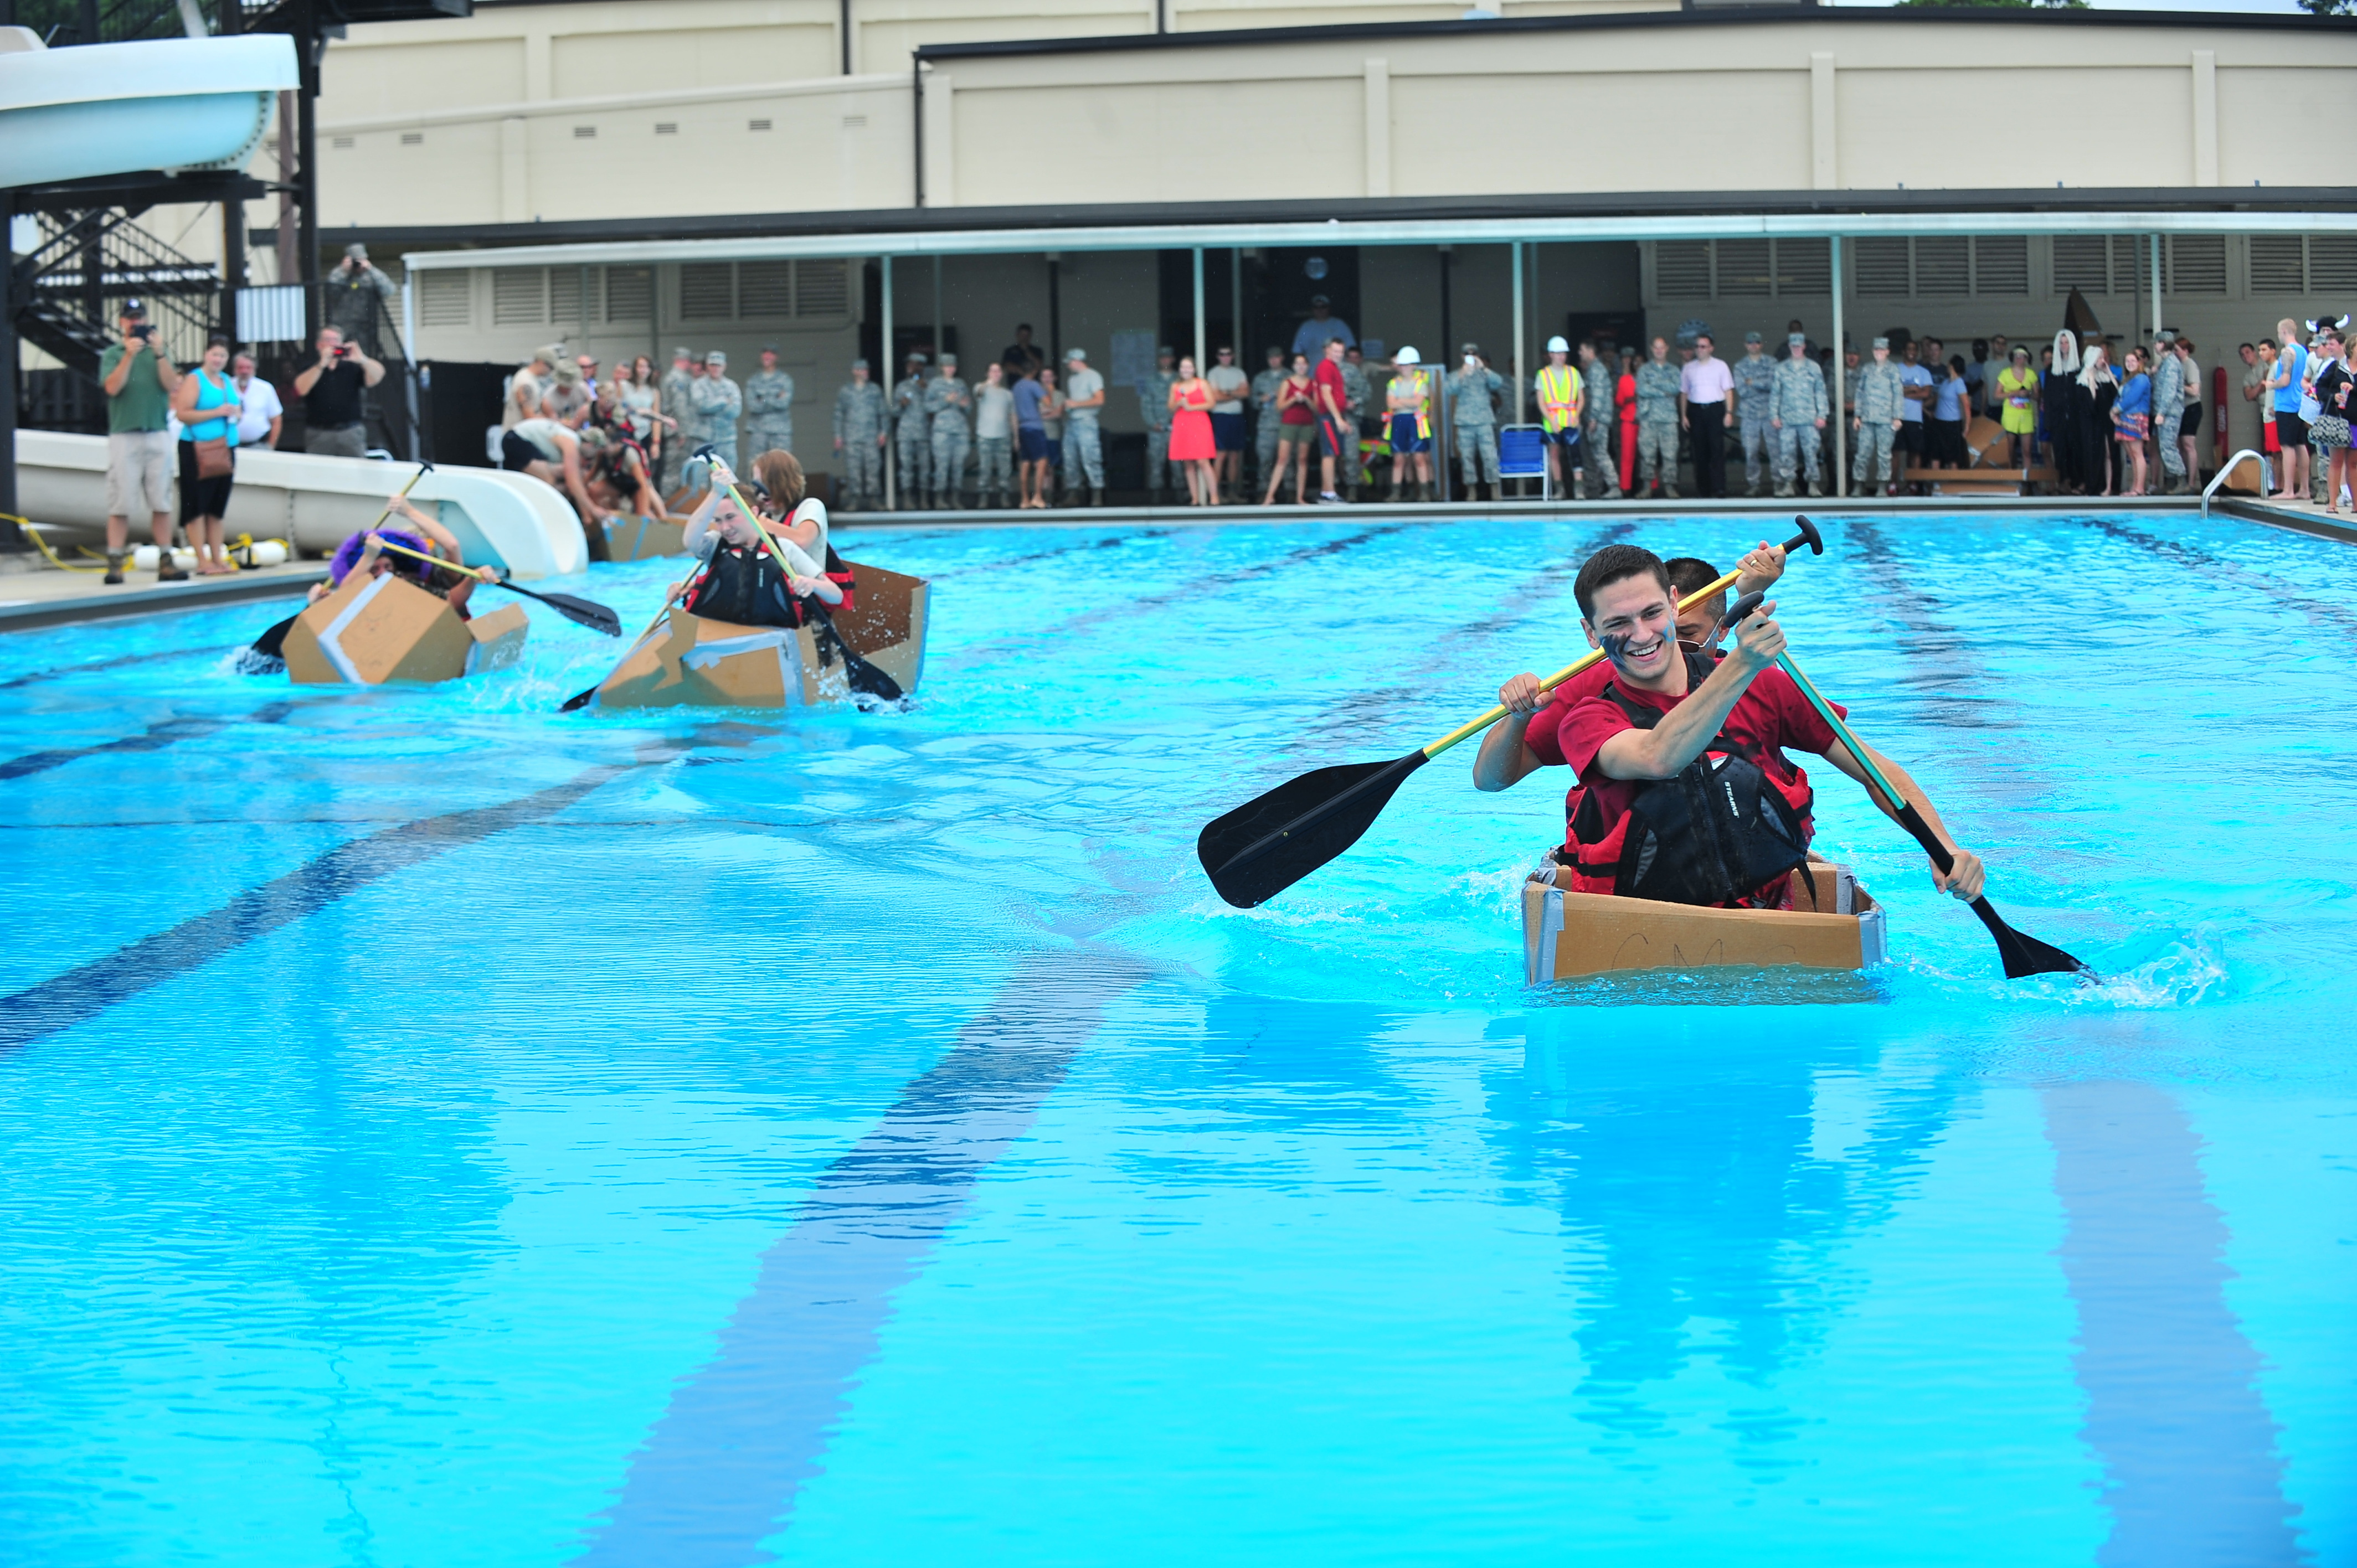 File sink or swim 130814 f yc840 wikimedia commons - Seymour johnson afb swimming pool ...